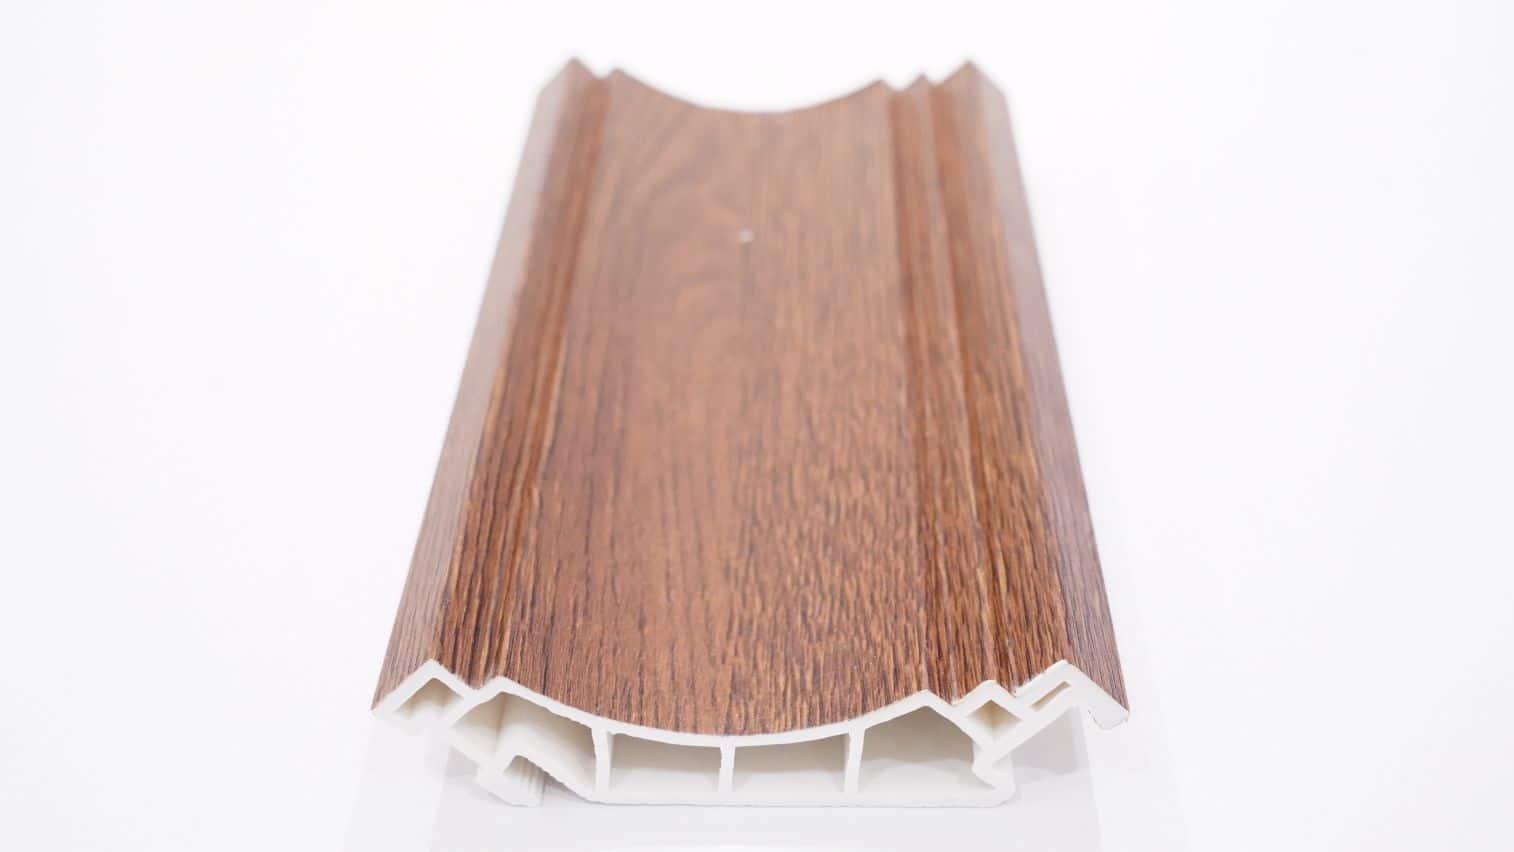 Phào cổ trần 100 - AnPro decorative molding